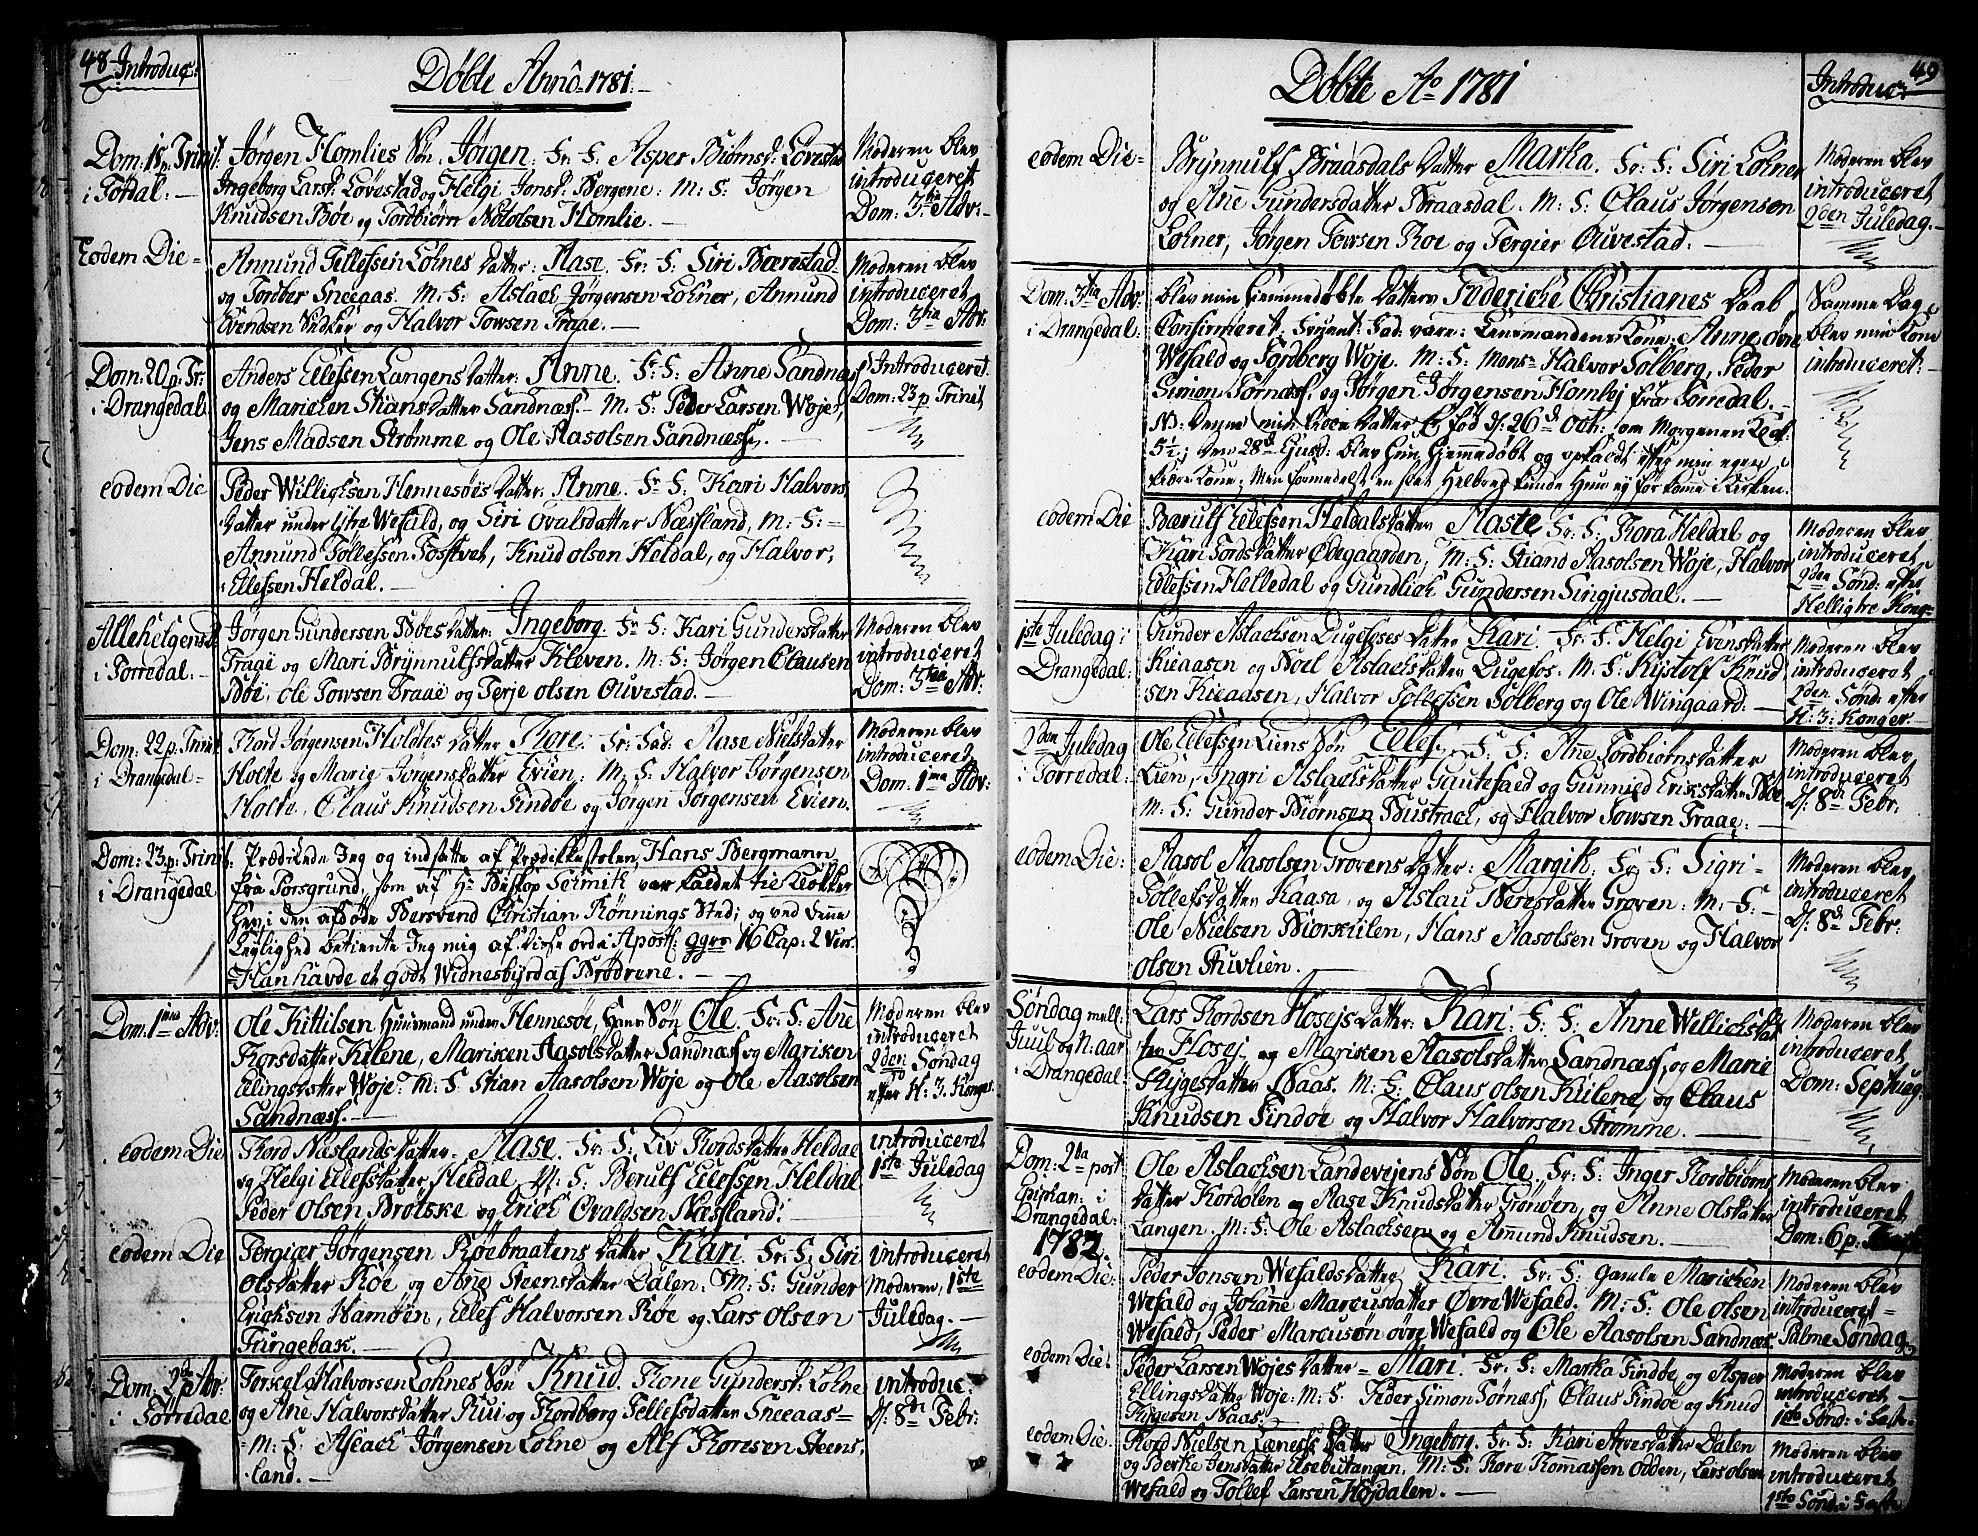 SAKO, Drangedal kirkebøker, F/Fa/L0003: Ministerialbok nr. 3, 1768-1814, s. 48-49